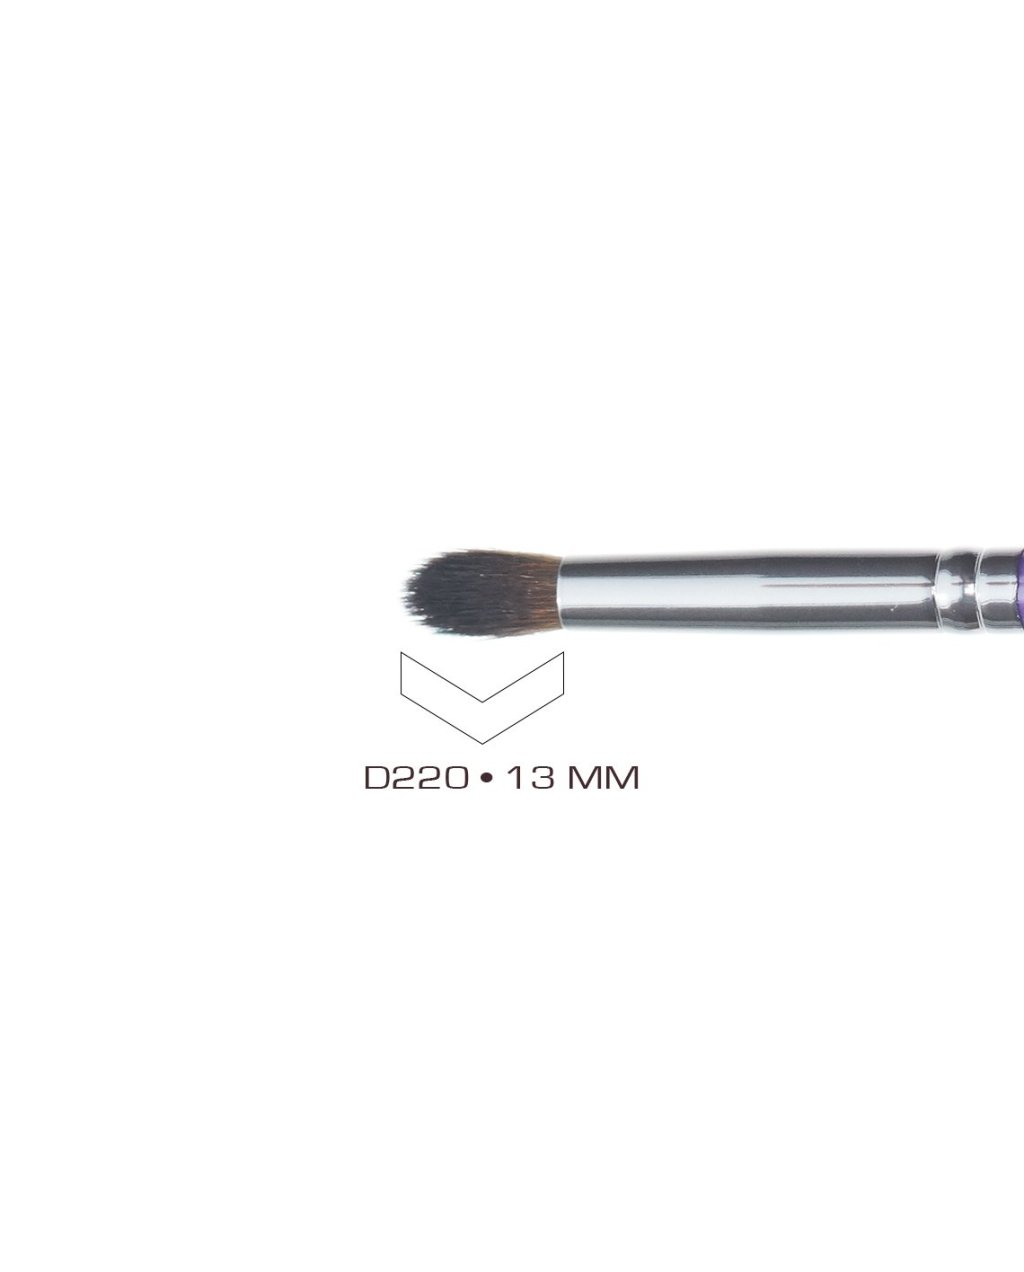 D220 Pencil Brush